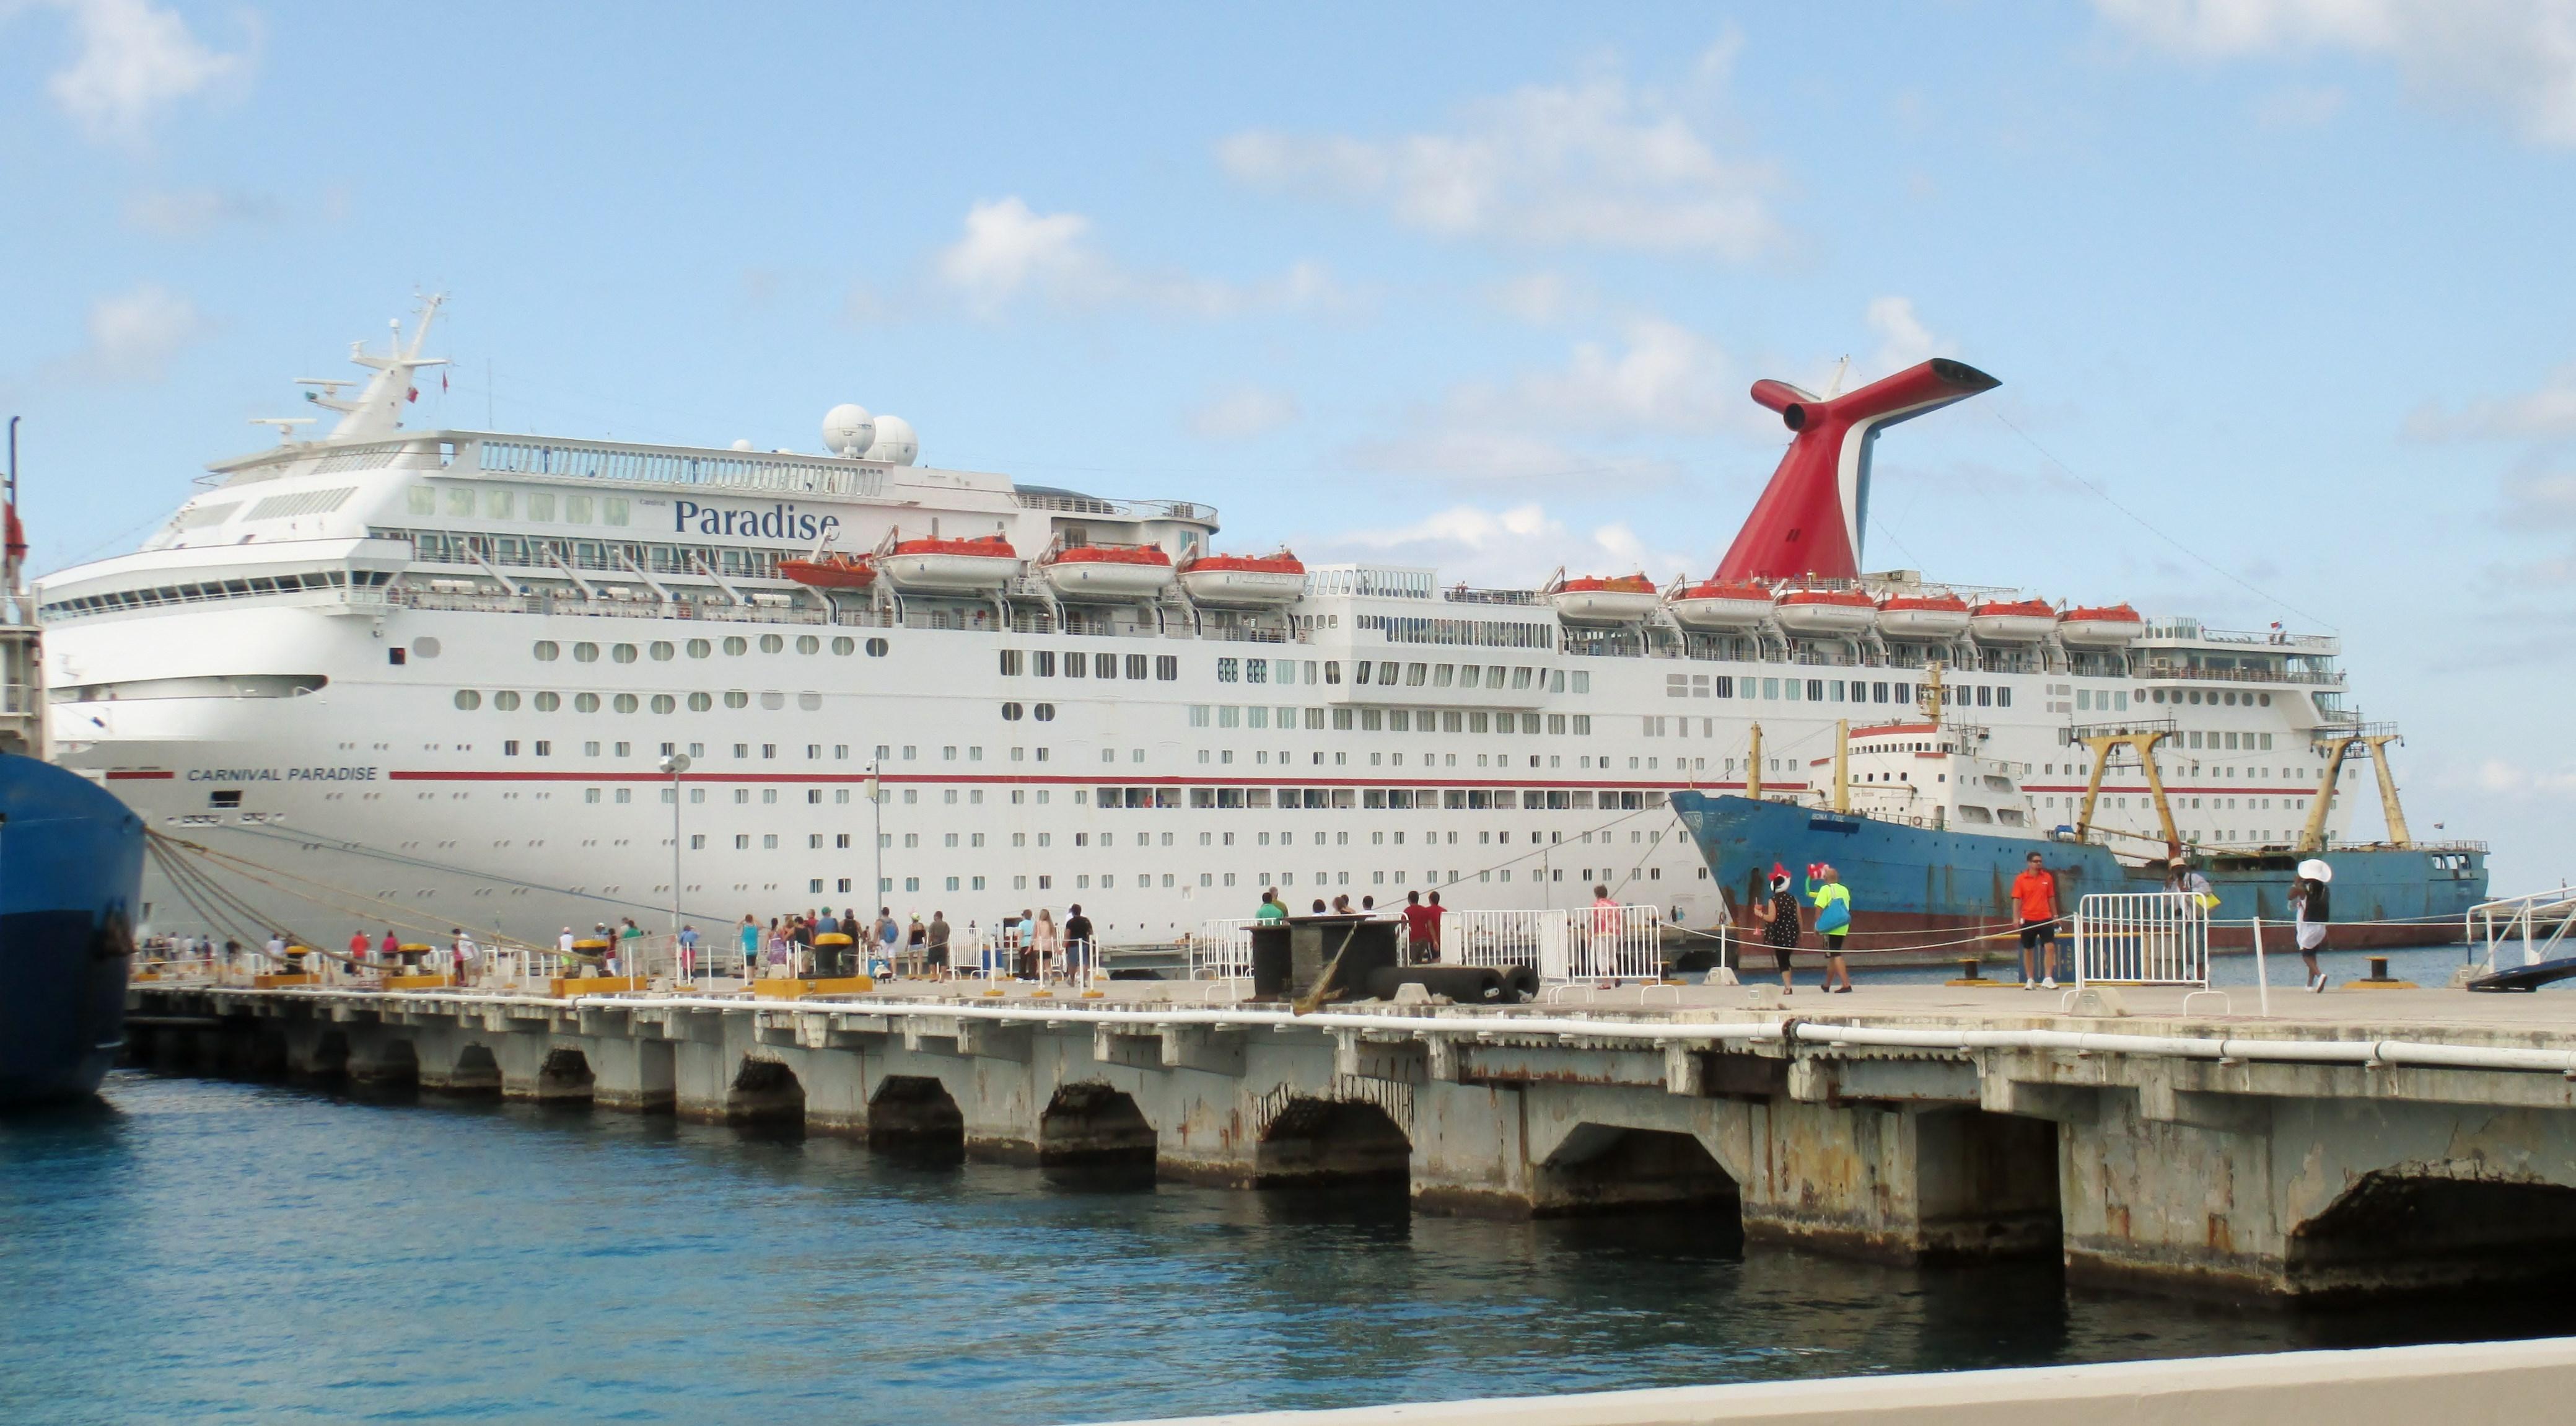 Carnival paradise cruise review jan 25 2014 a lovely cruise cruiser photos baanklon Choice Image